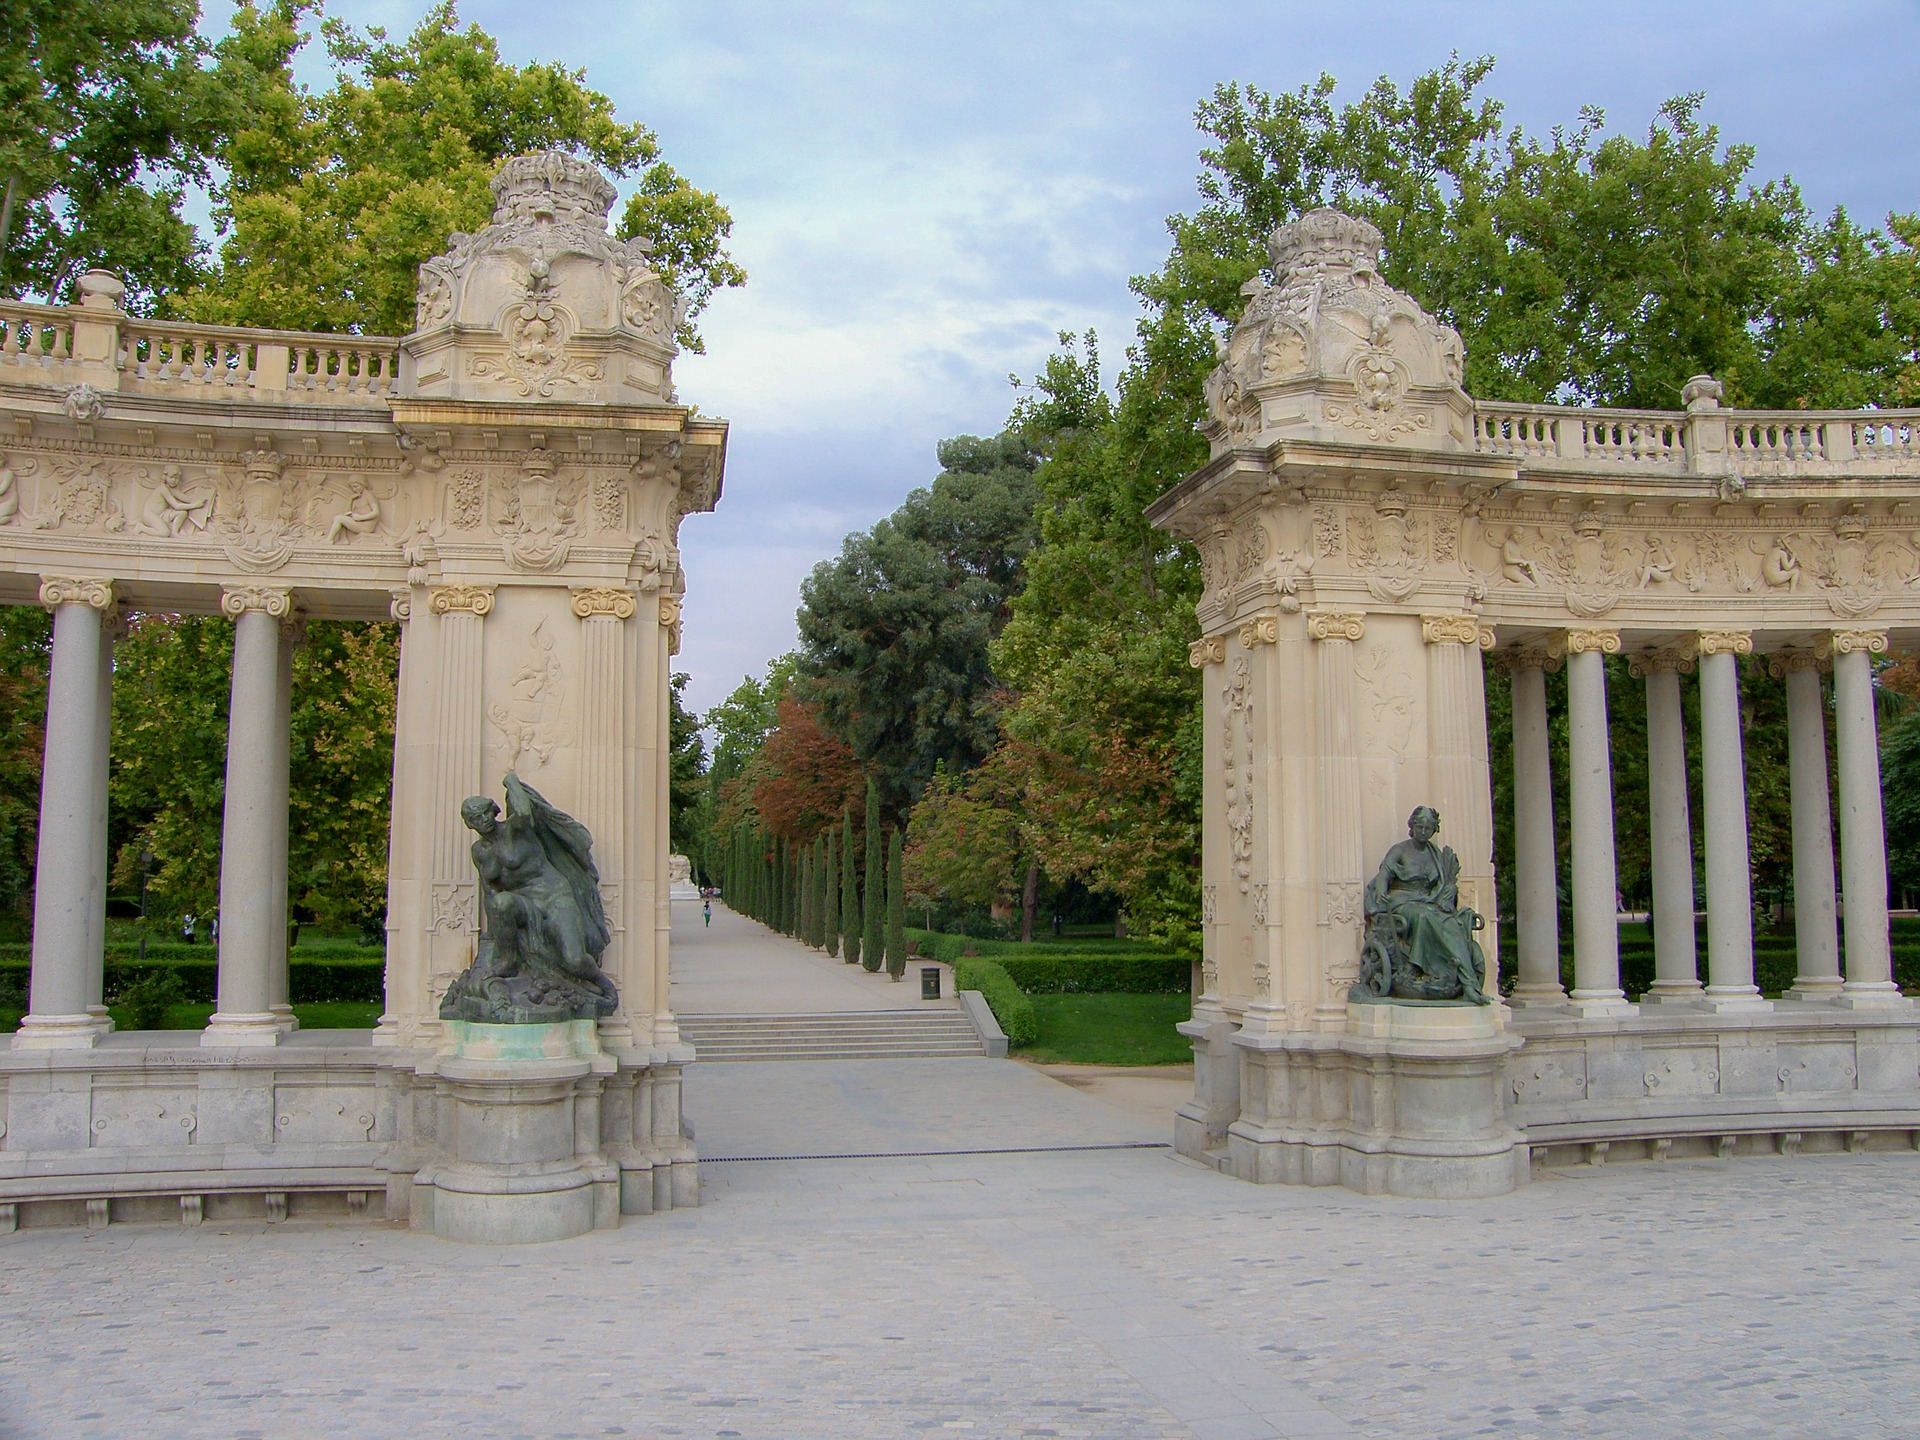 monument-177125_1920.jpg